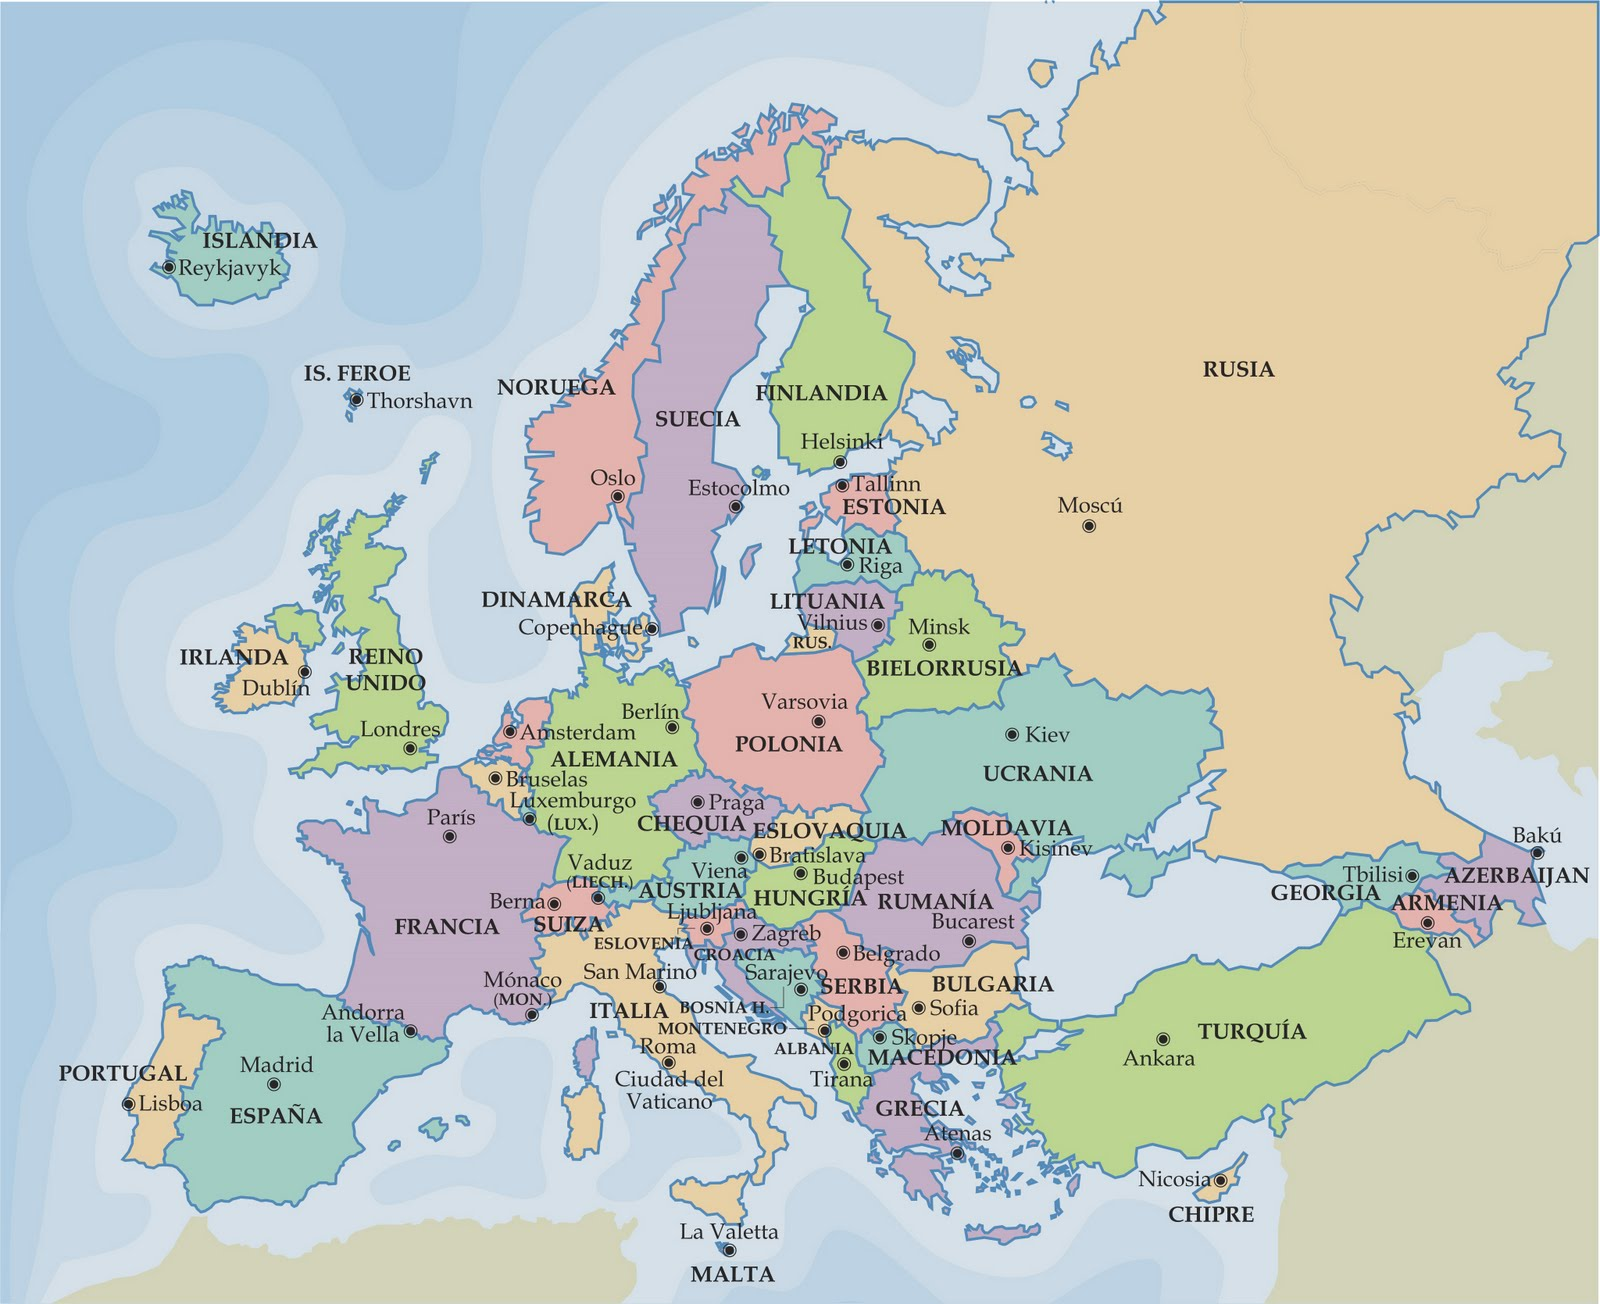 Worksheet. Capitales De Europa Juego Mapa